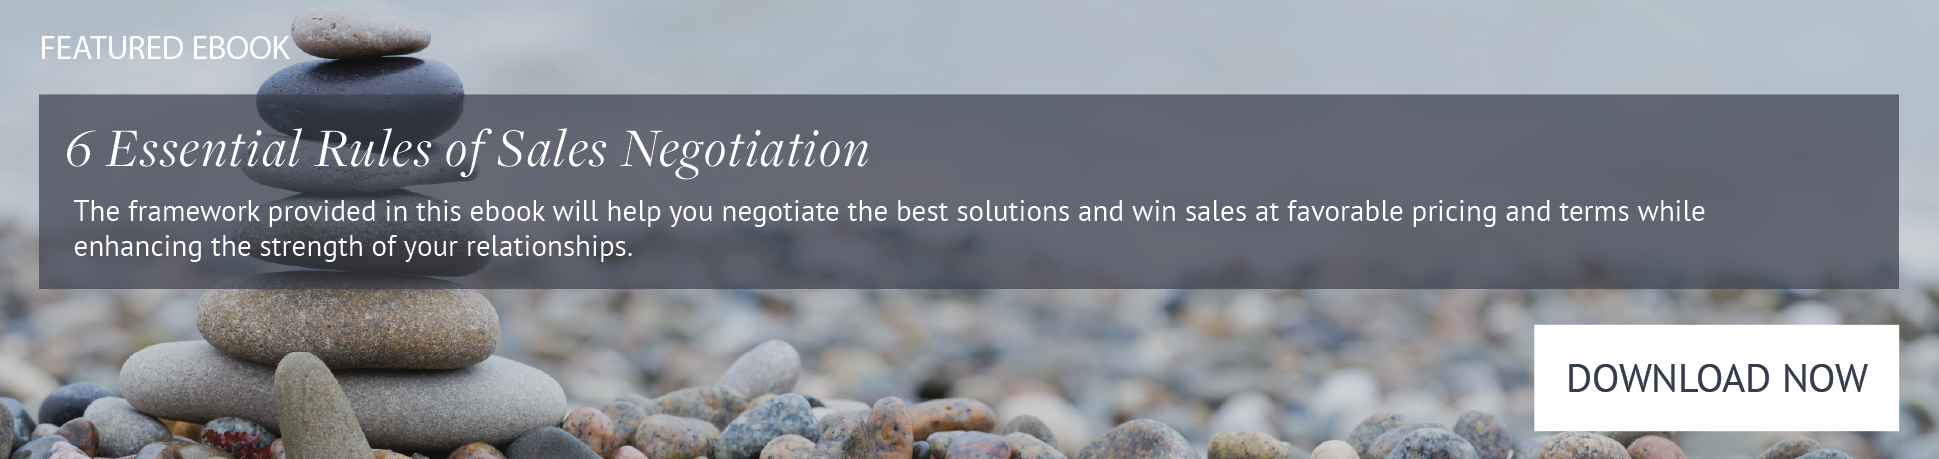 6 Essential Rules of Sales Negotiation Ebook